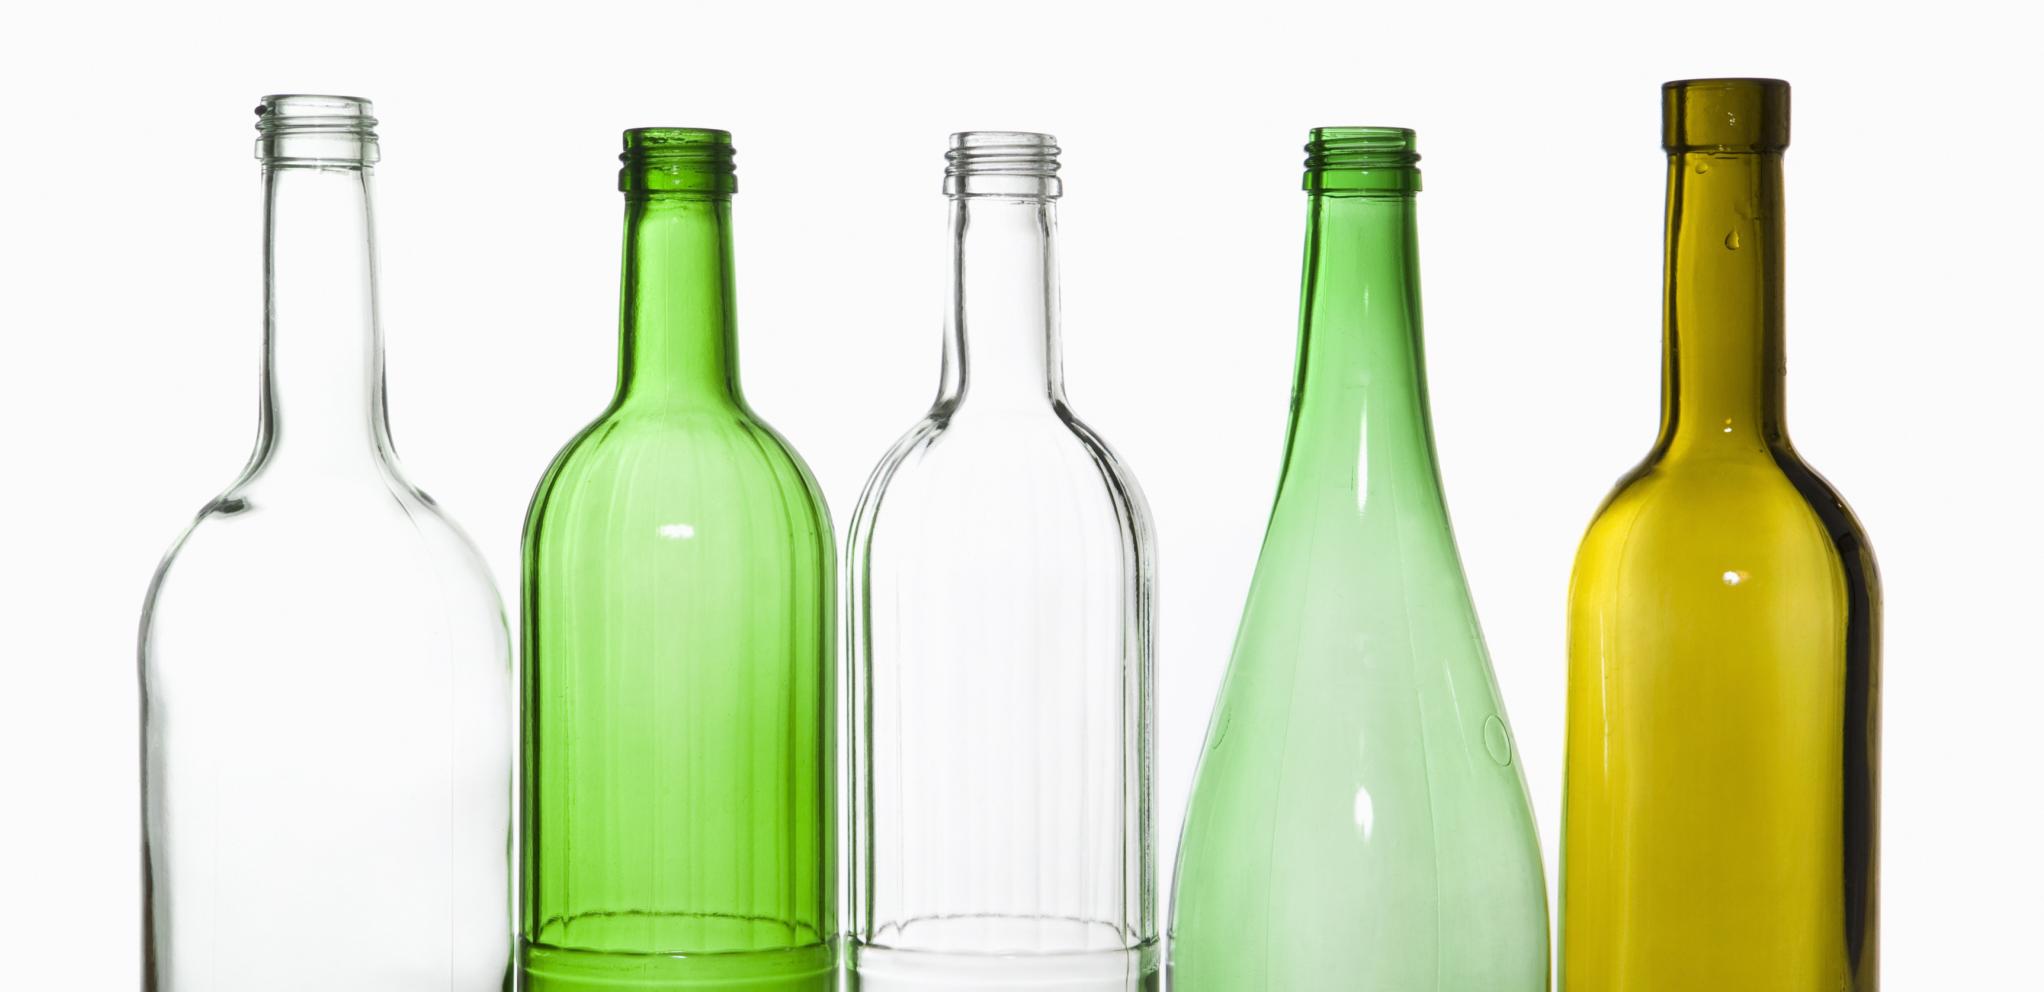 Bottles HD wallpapers, Desktop wallpaper - most viewed